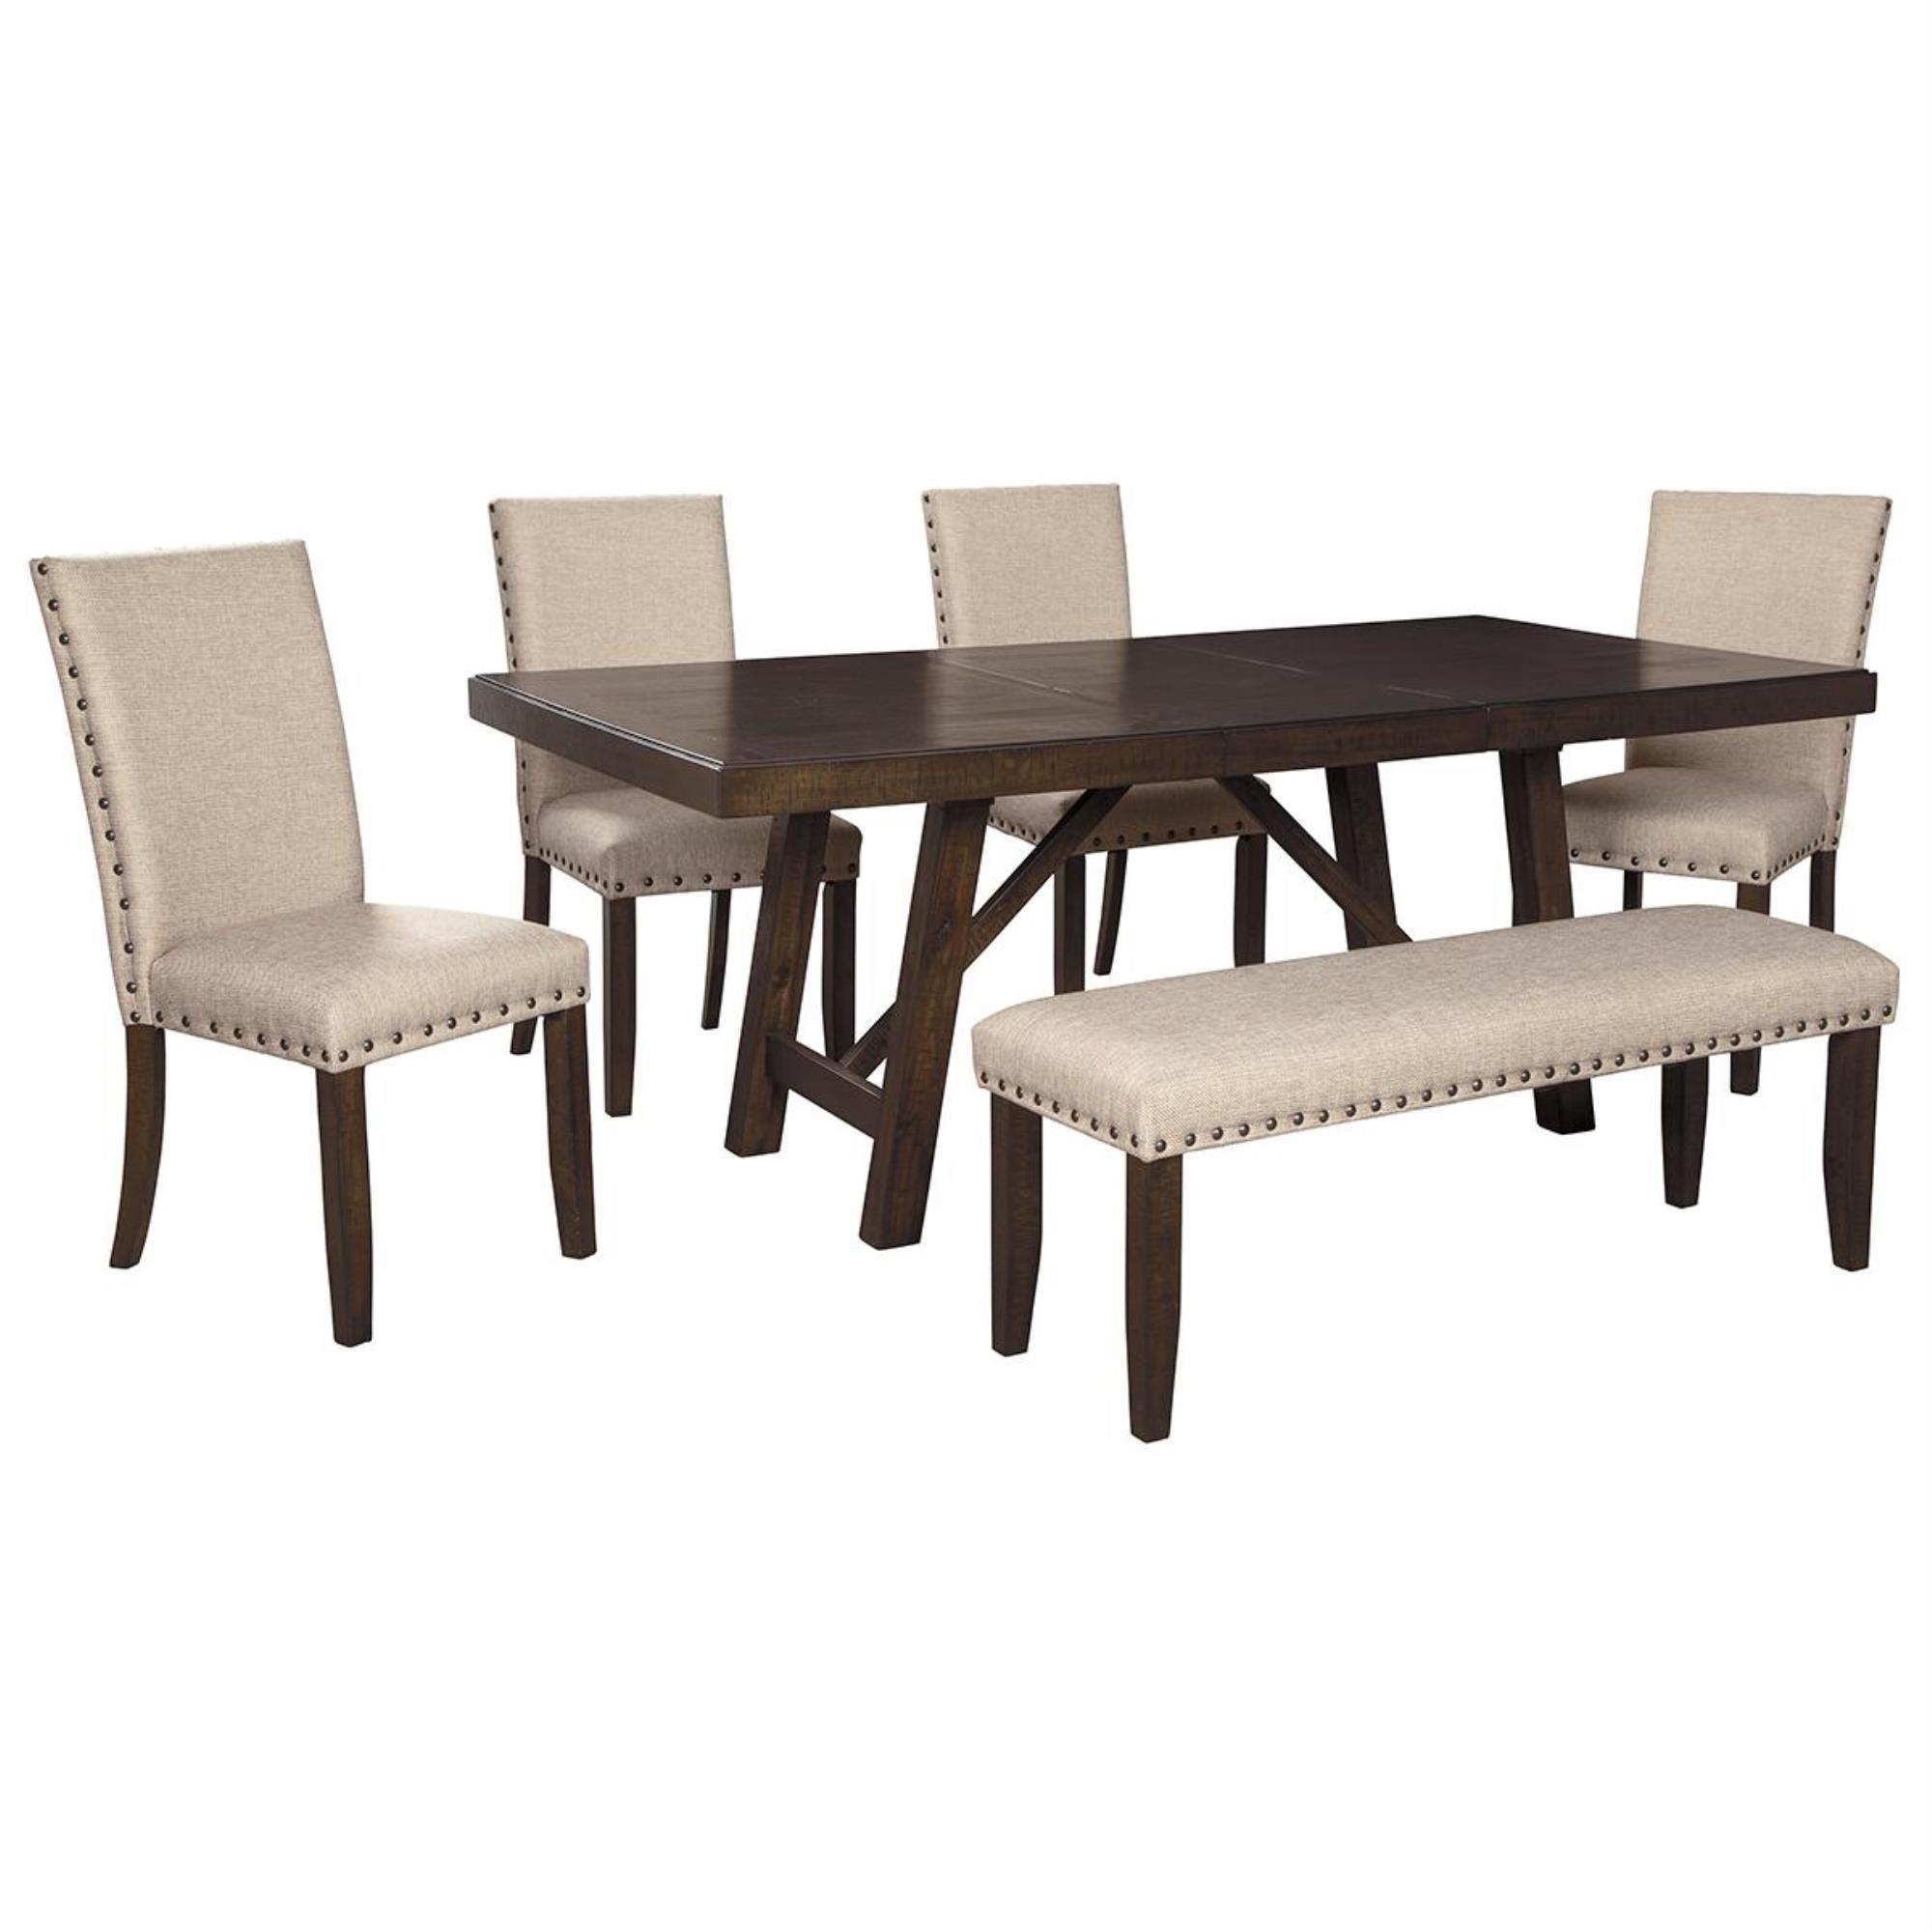 By Ashley Rokane 6 Piece Dining Set, 6 Piece Dining Room Set